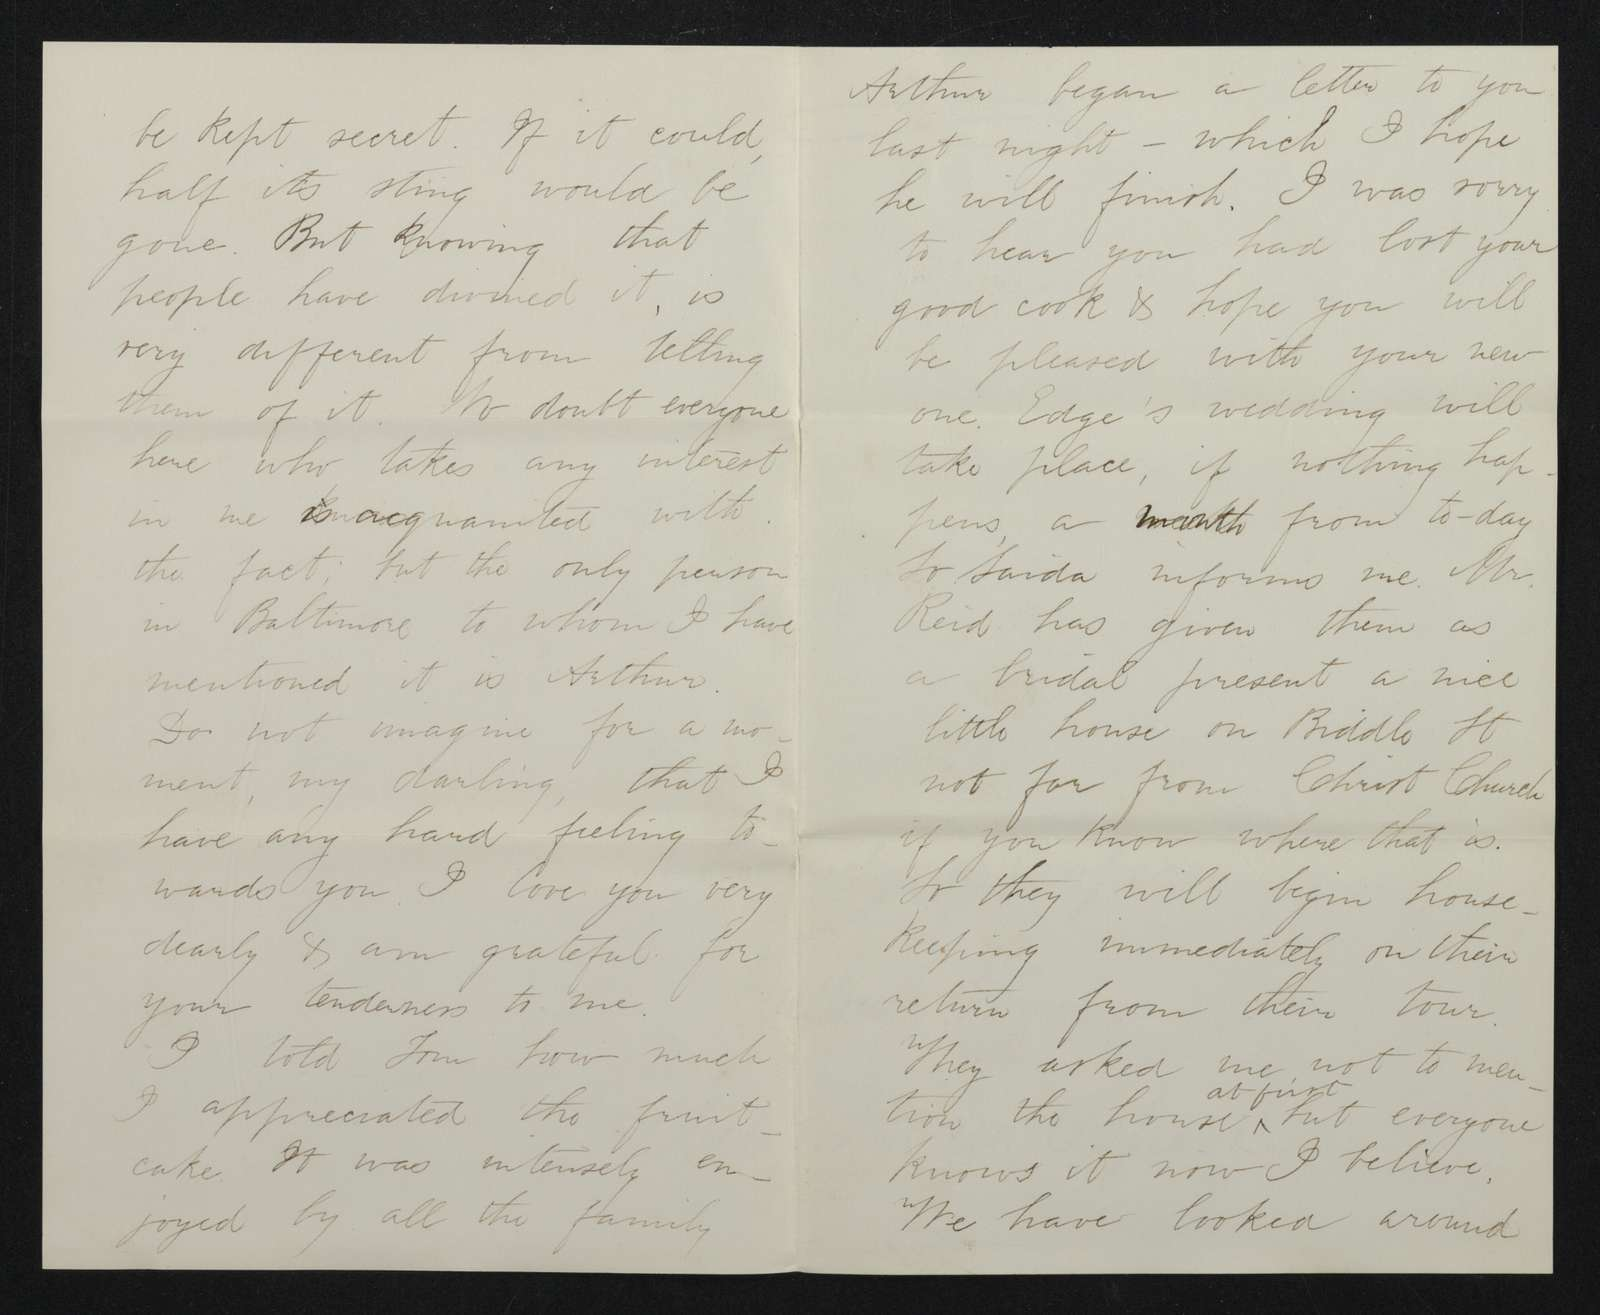 Lewis H. Machen Family Papers: Gresham Family Correspondence, 1834-1925; 1875-1877